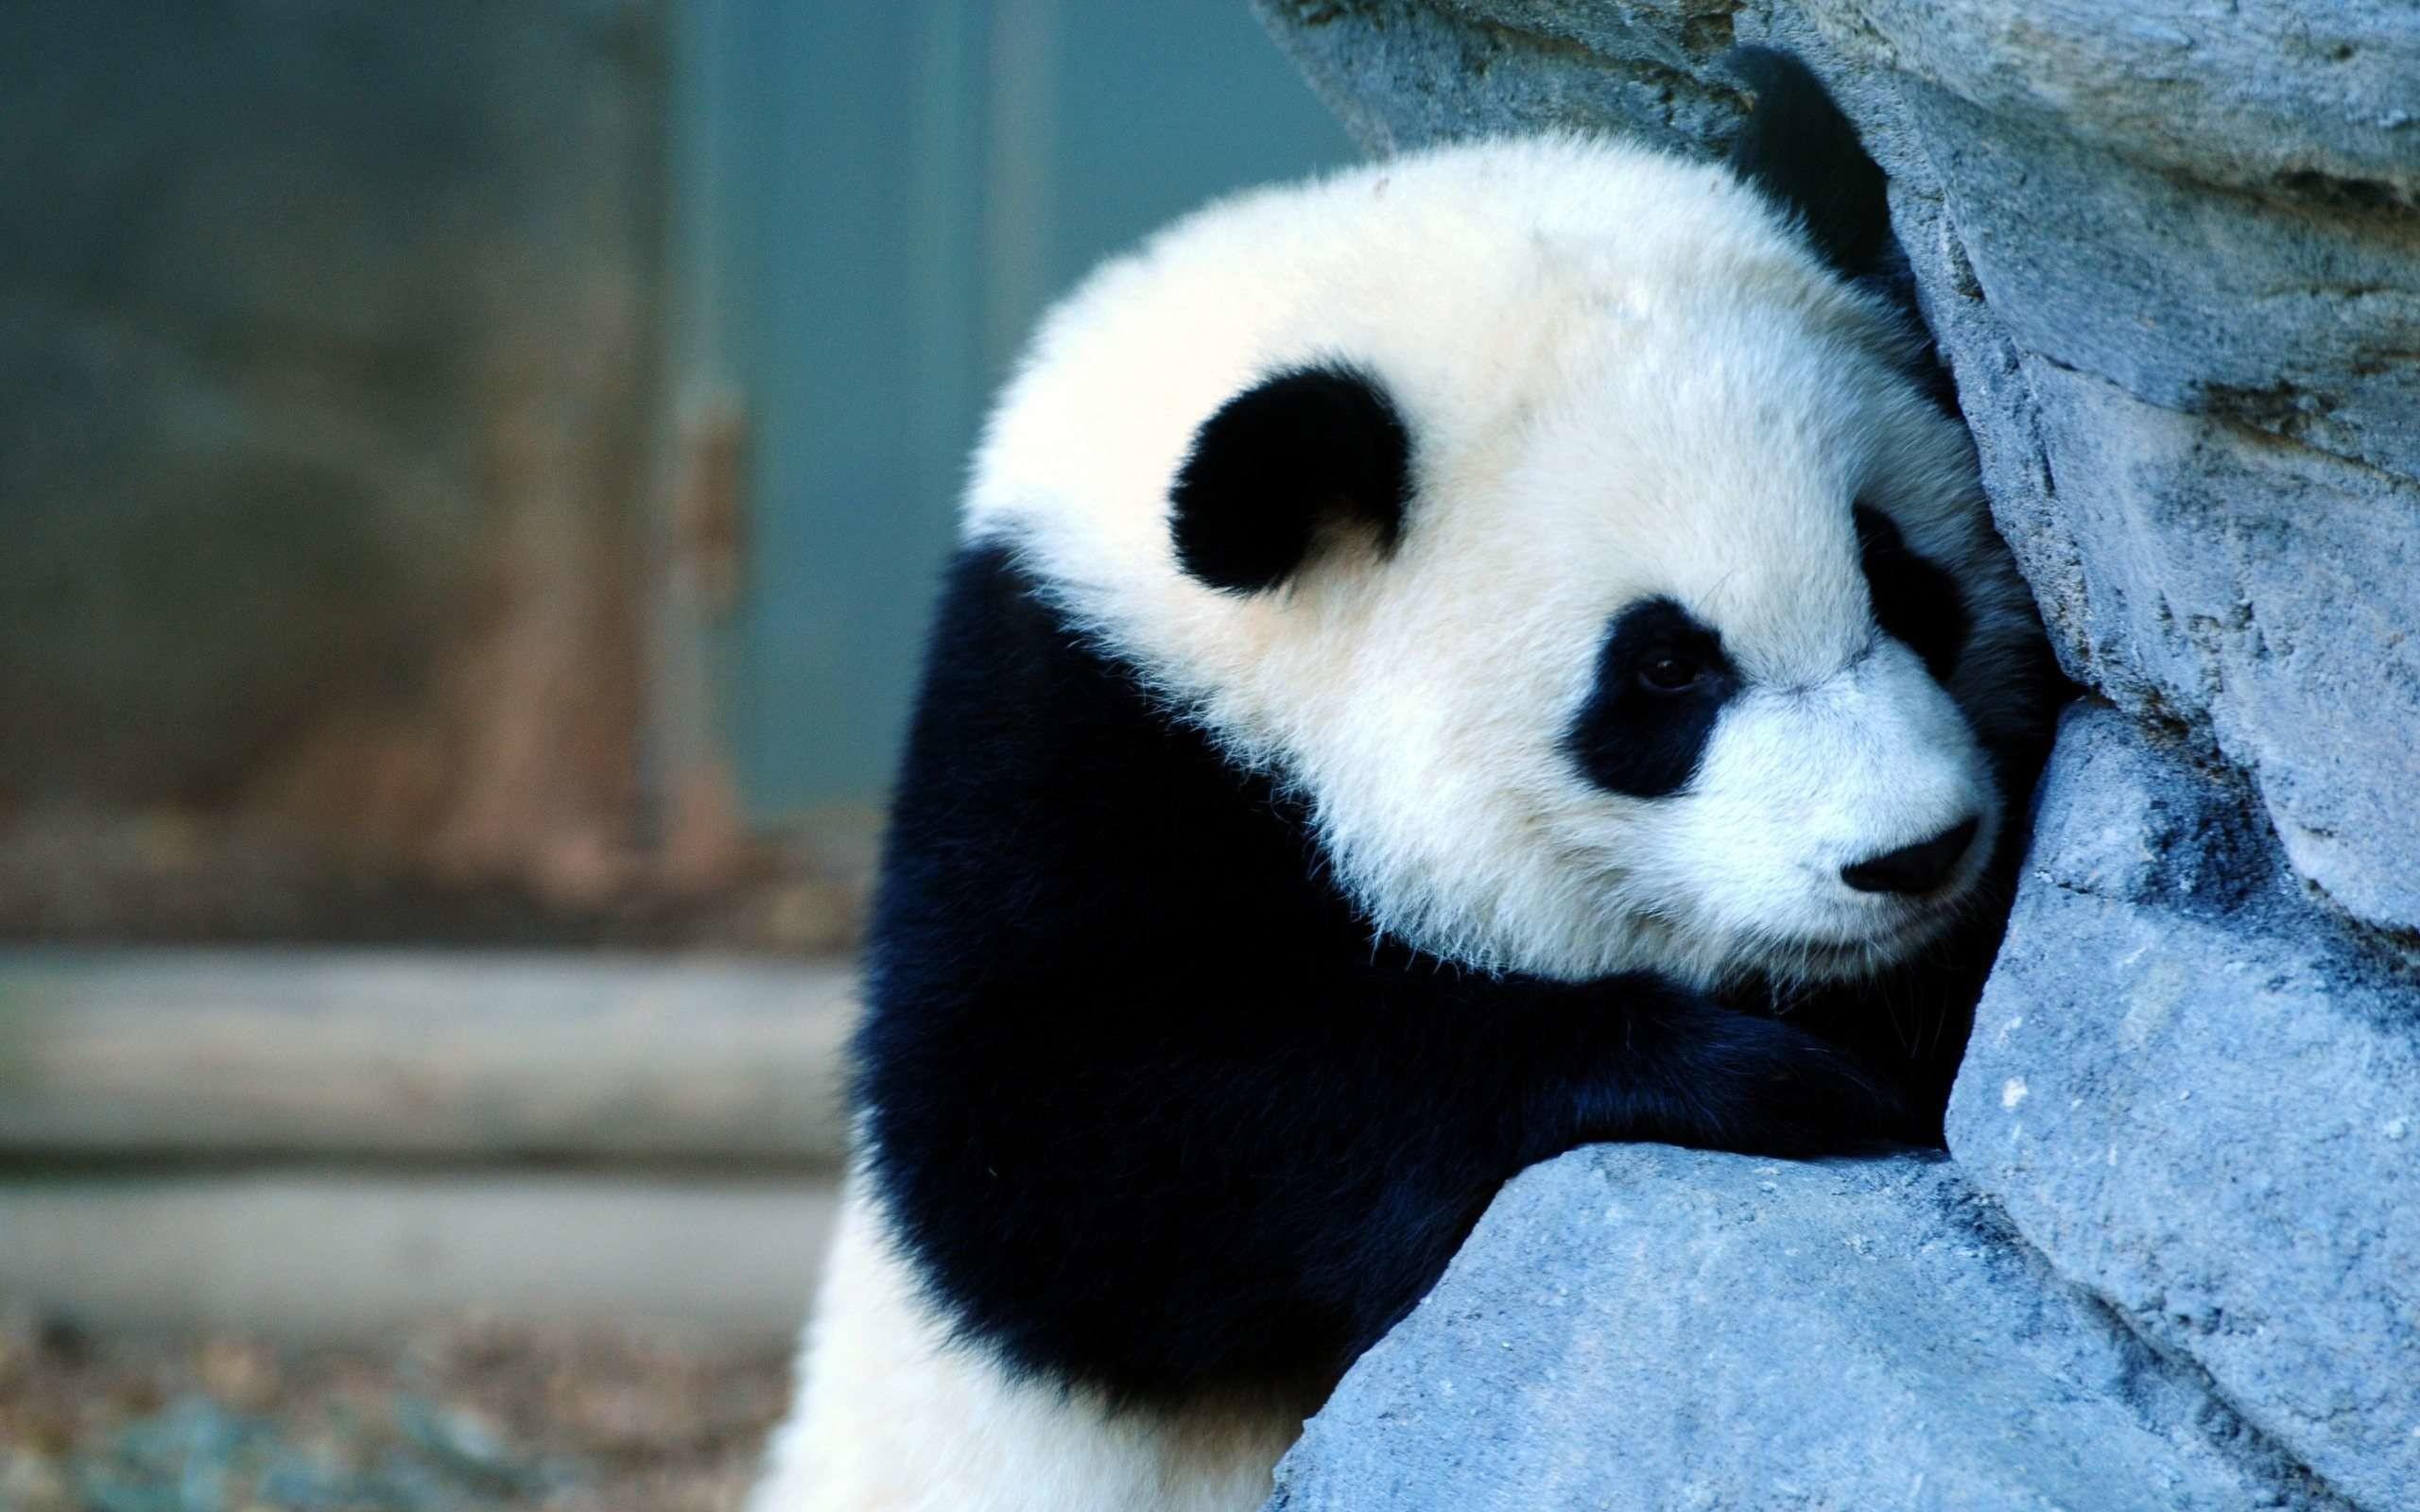 Animals For > Cute Panda Wallpaper Iphone